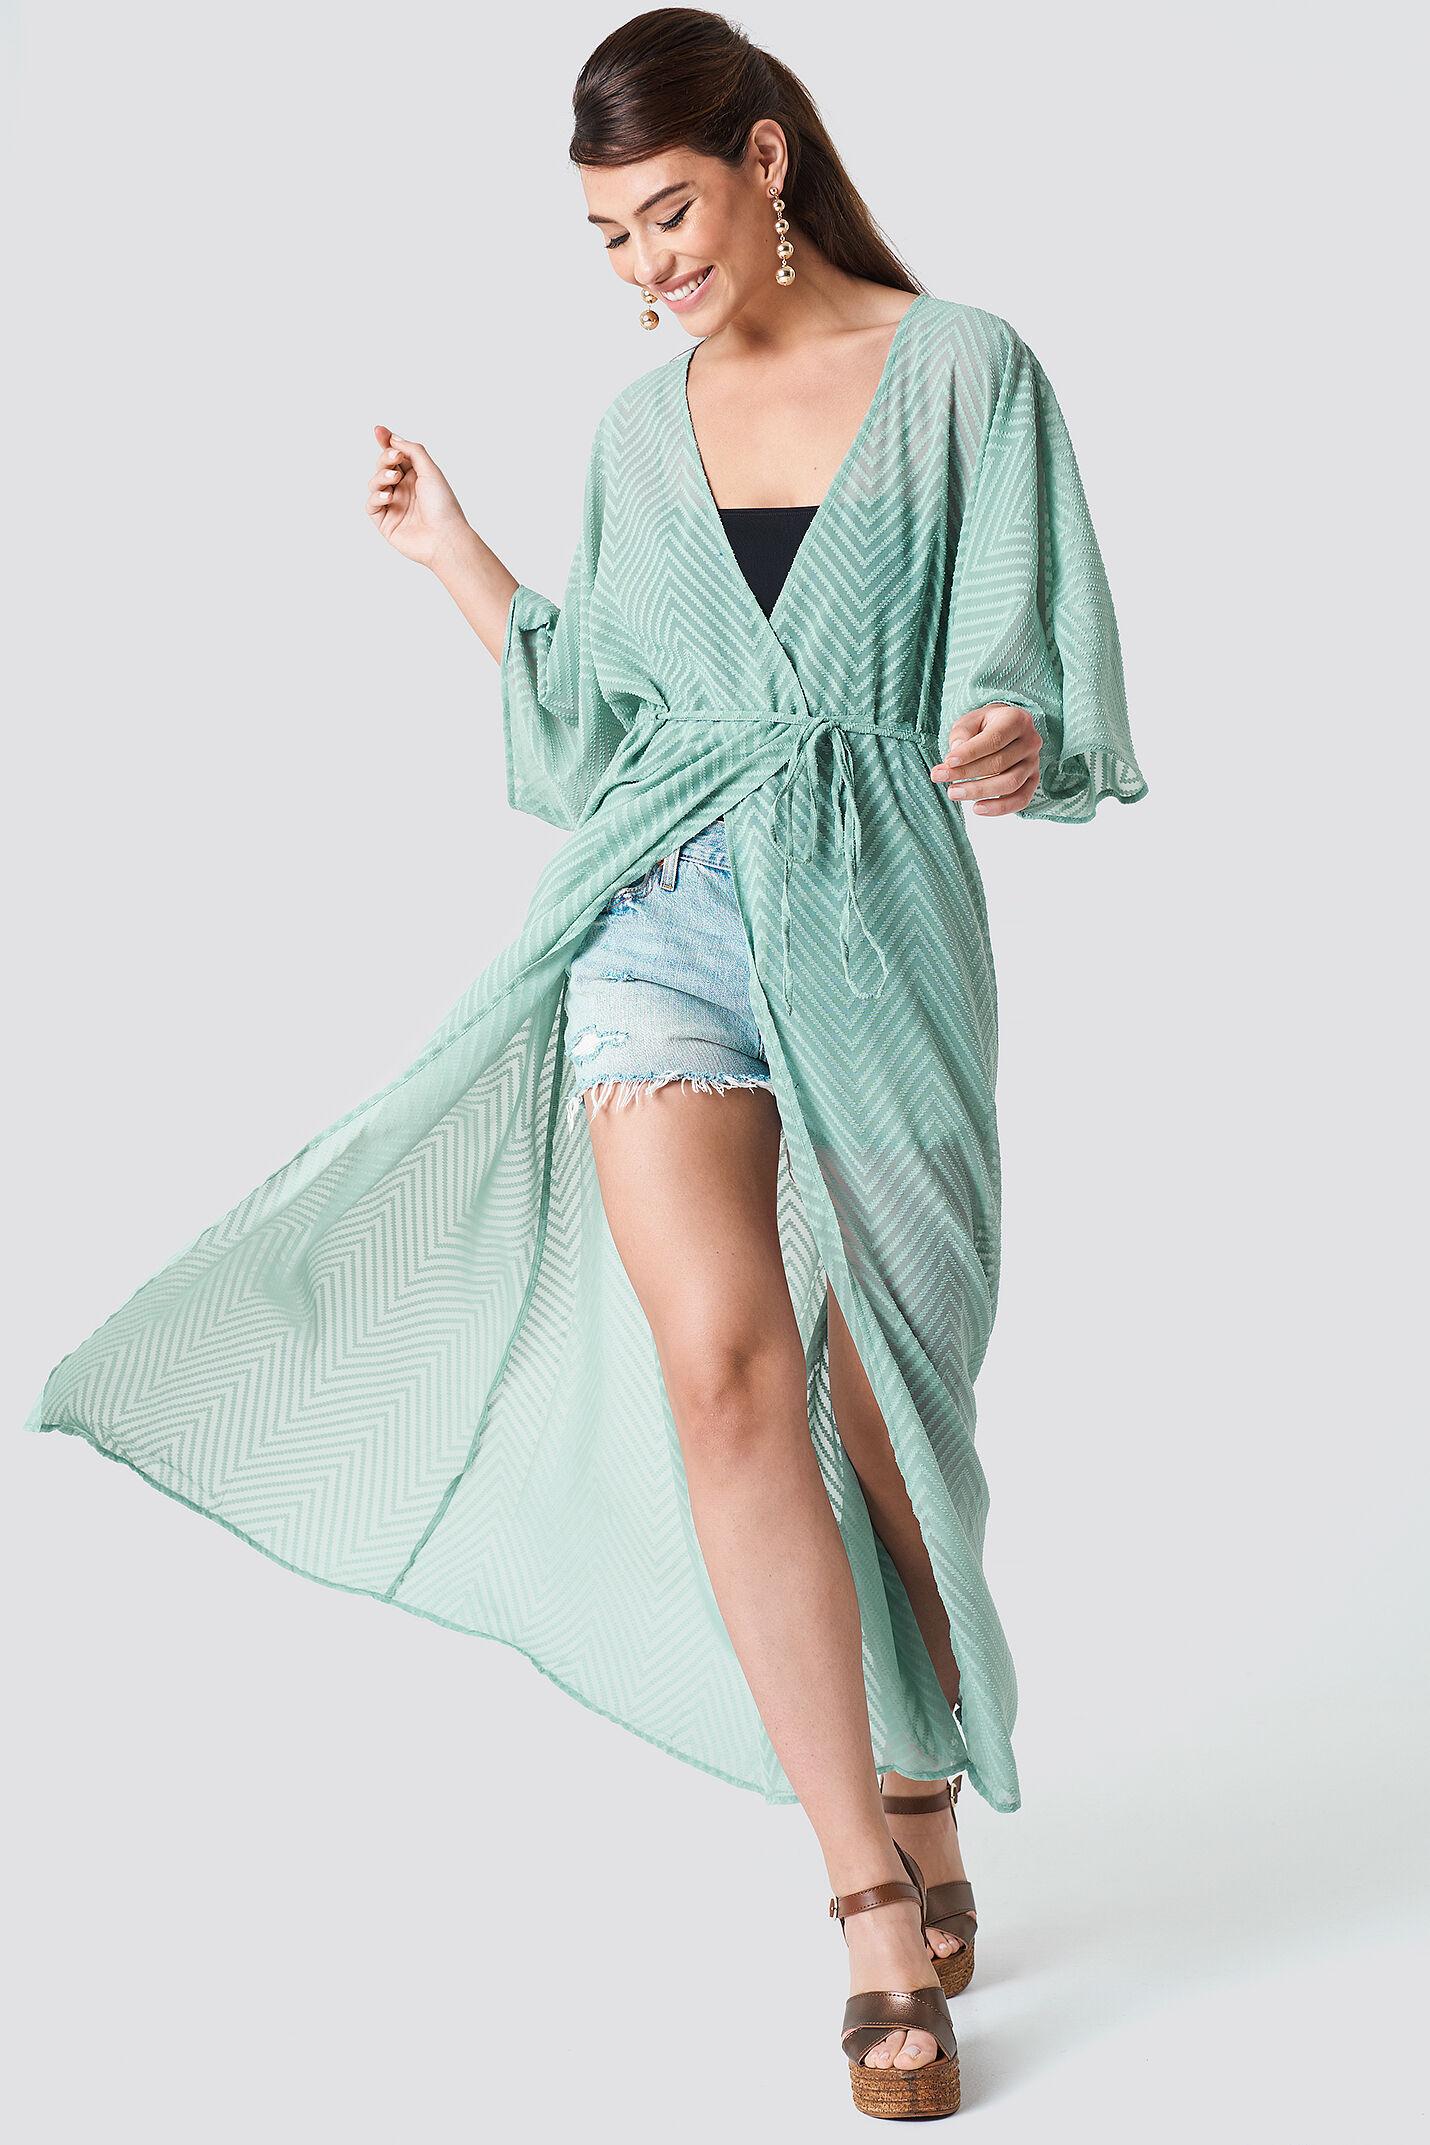 Image of NA-KD Boho Structured Chiffon Coat Dress - Green